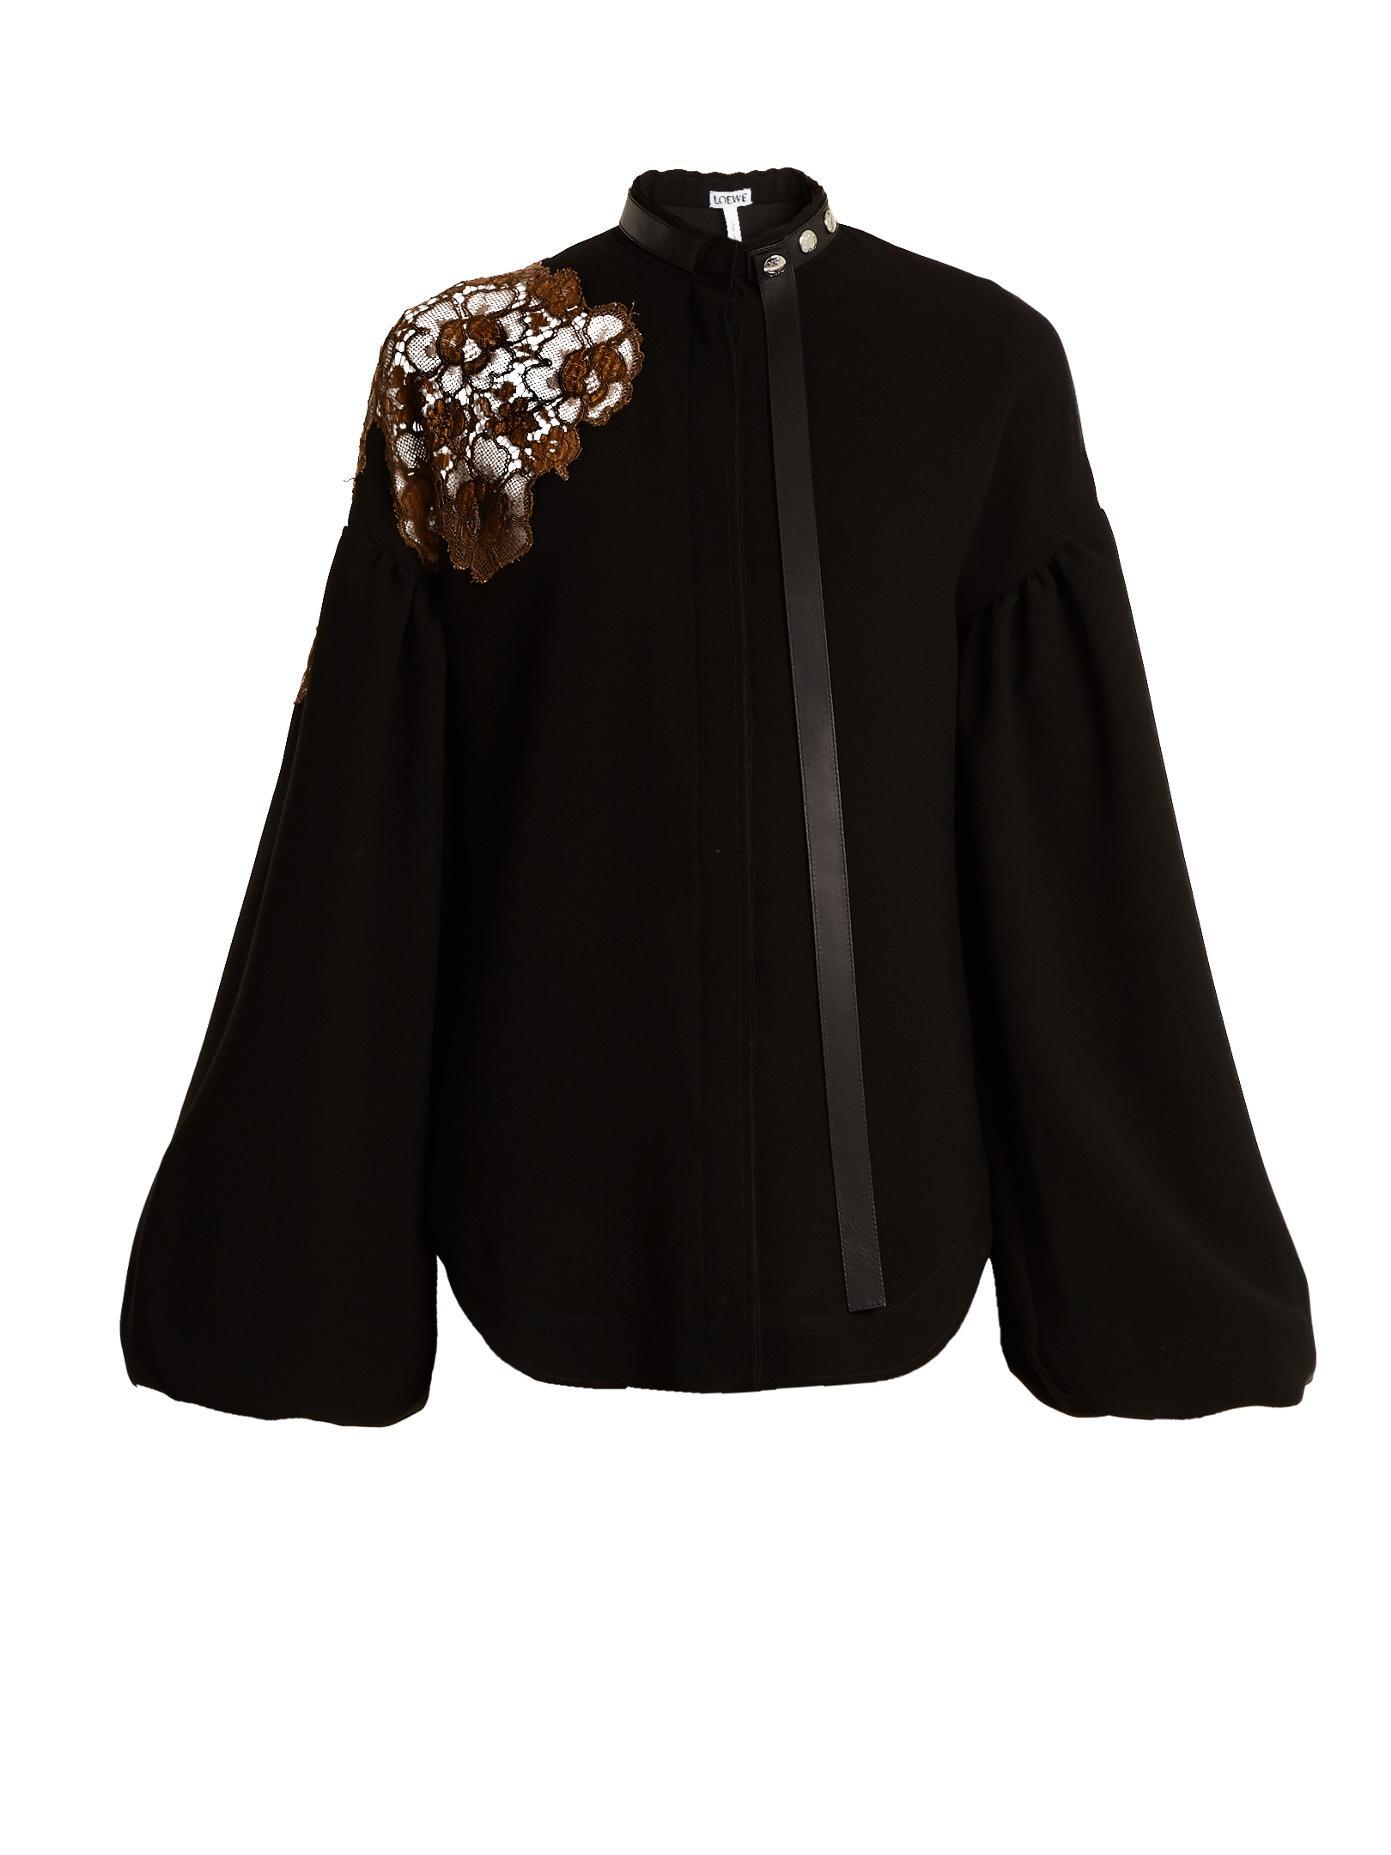 Loewe Floral-Lace Embellished Bell-Sleeved Crepe Top In Black